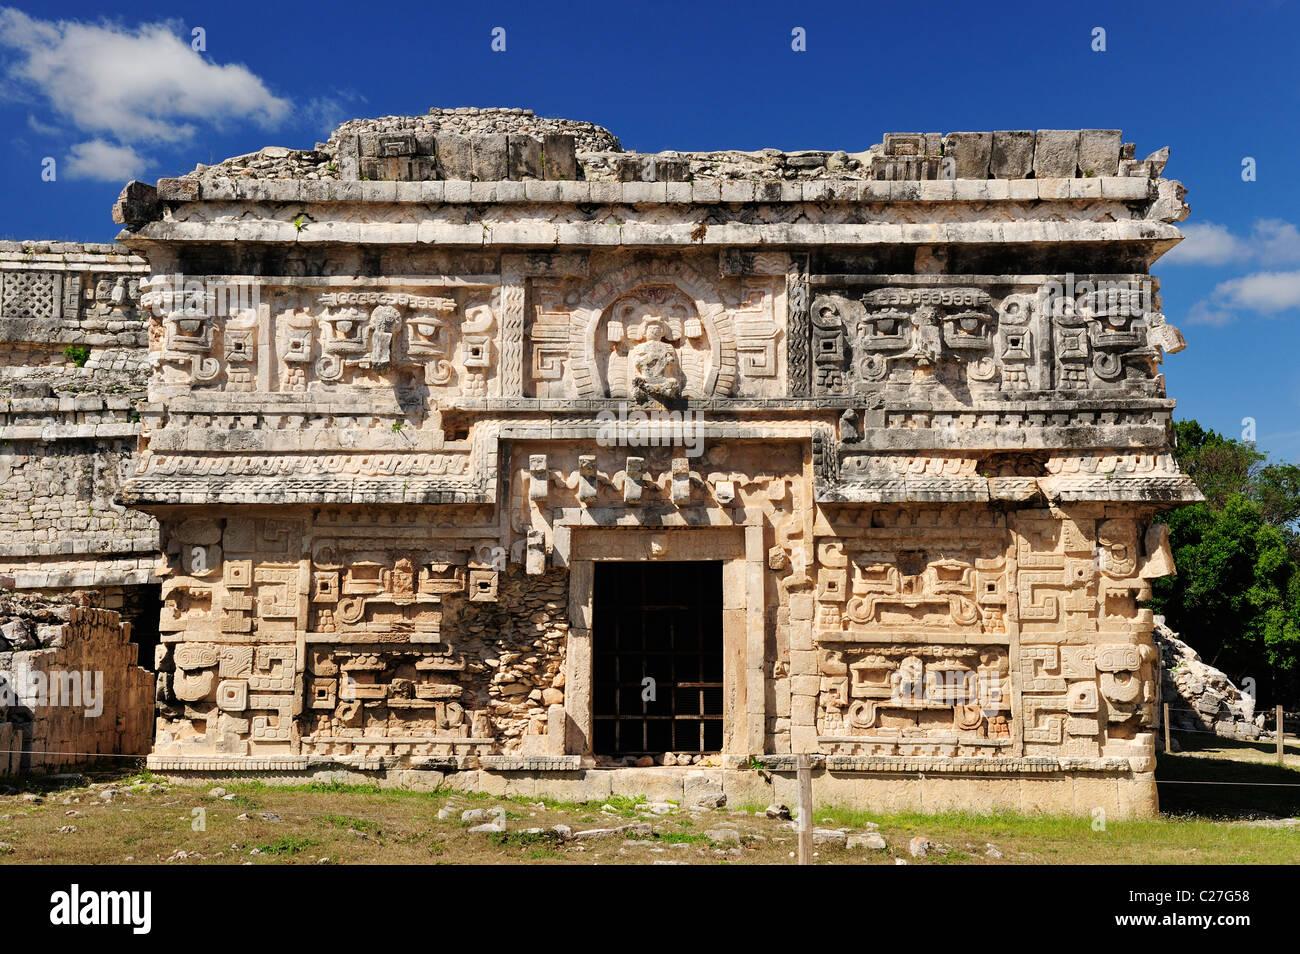 The Nunnery at Chichen Itza, Yucatan, Mexico - Stock Image